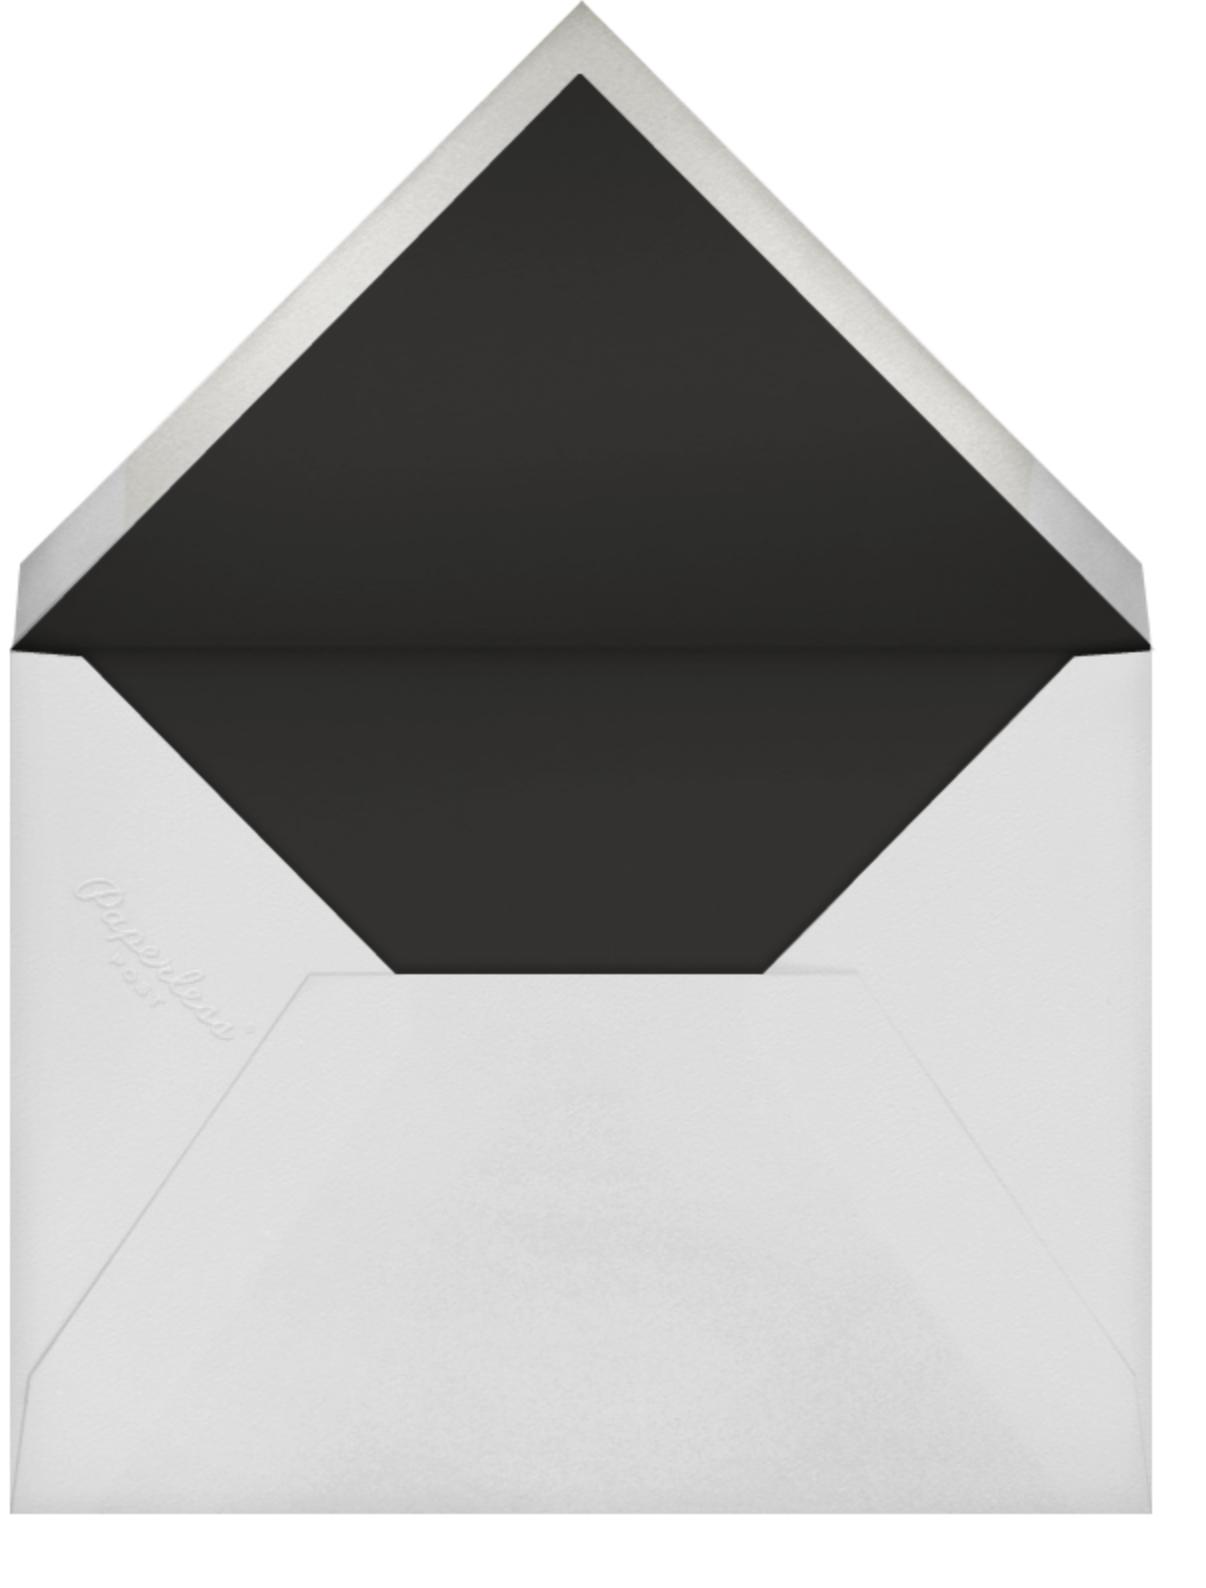 Gardenia - White/Rose Gold - Oscar de la Renta - All - envelope back